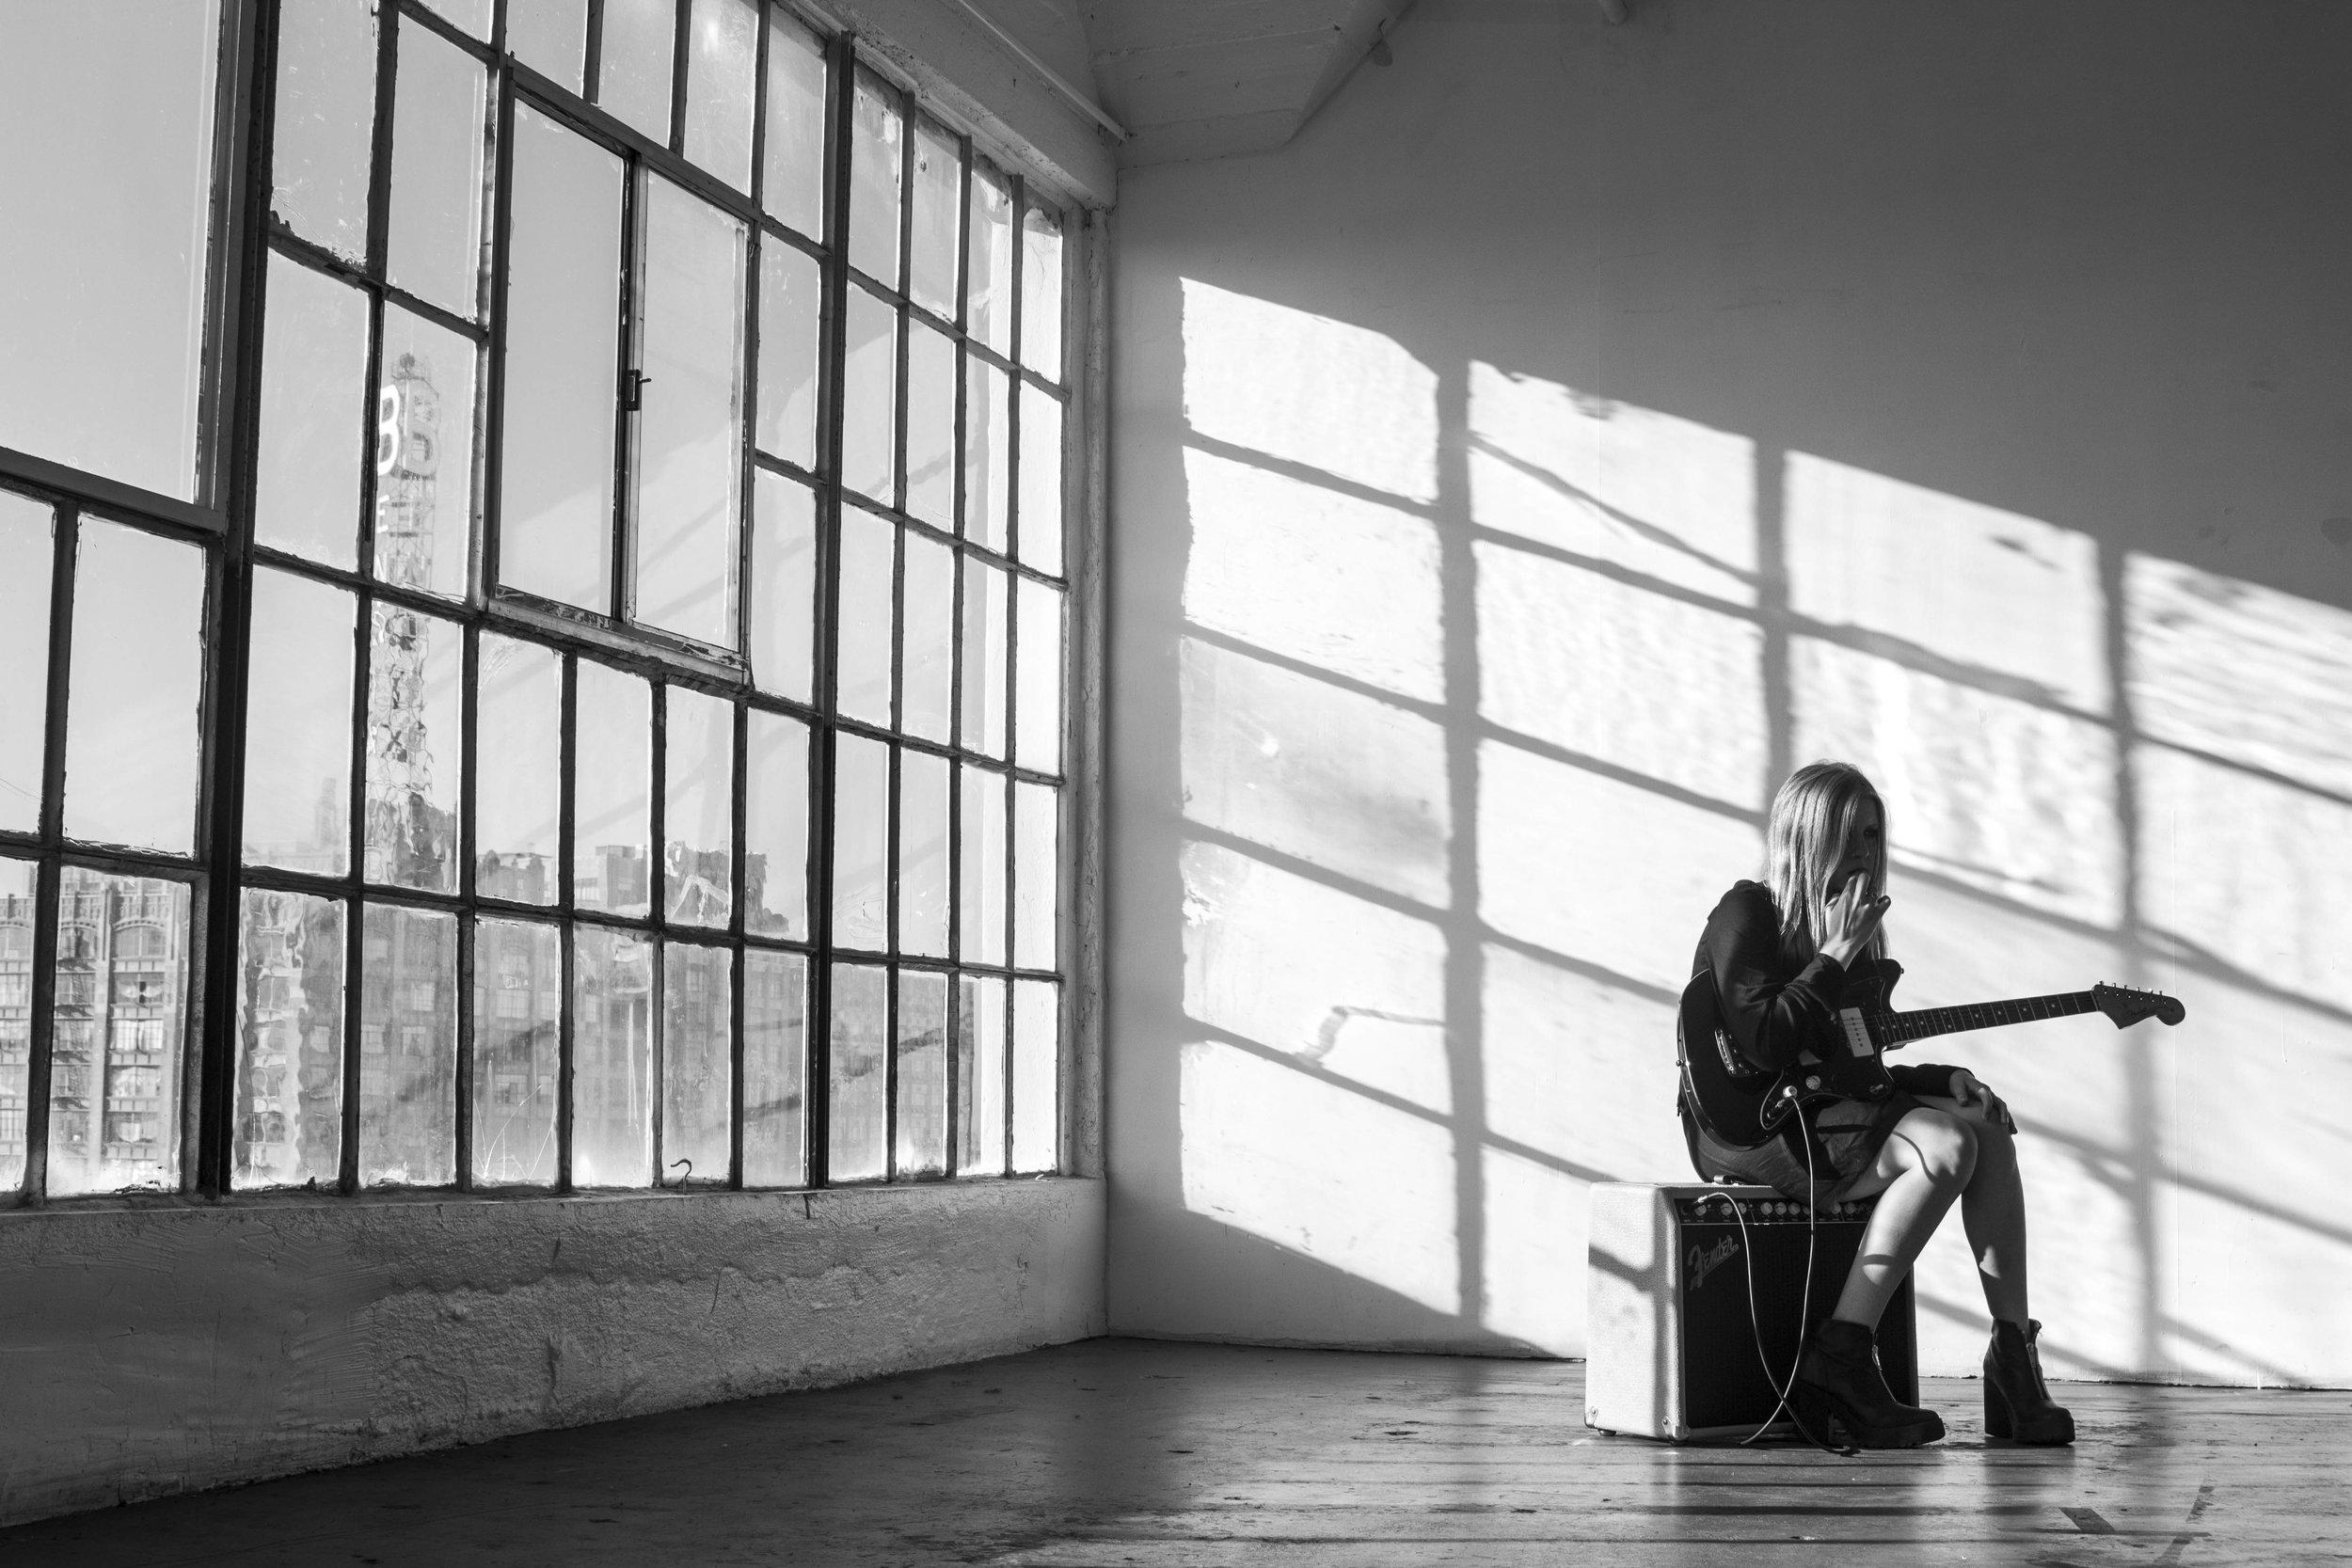 WRENN_bw_by window with guitar.jpg